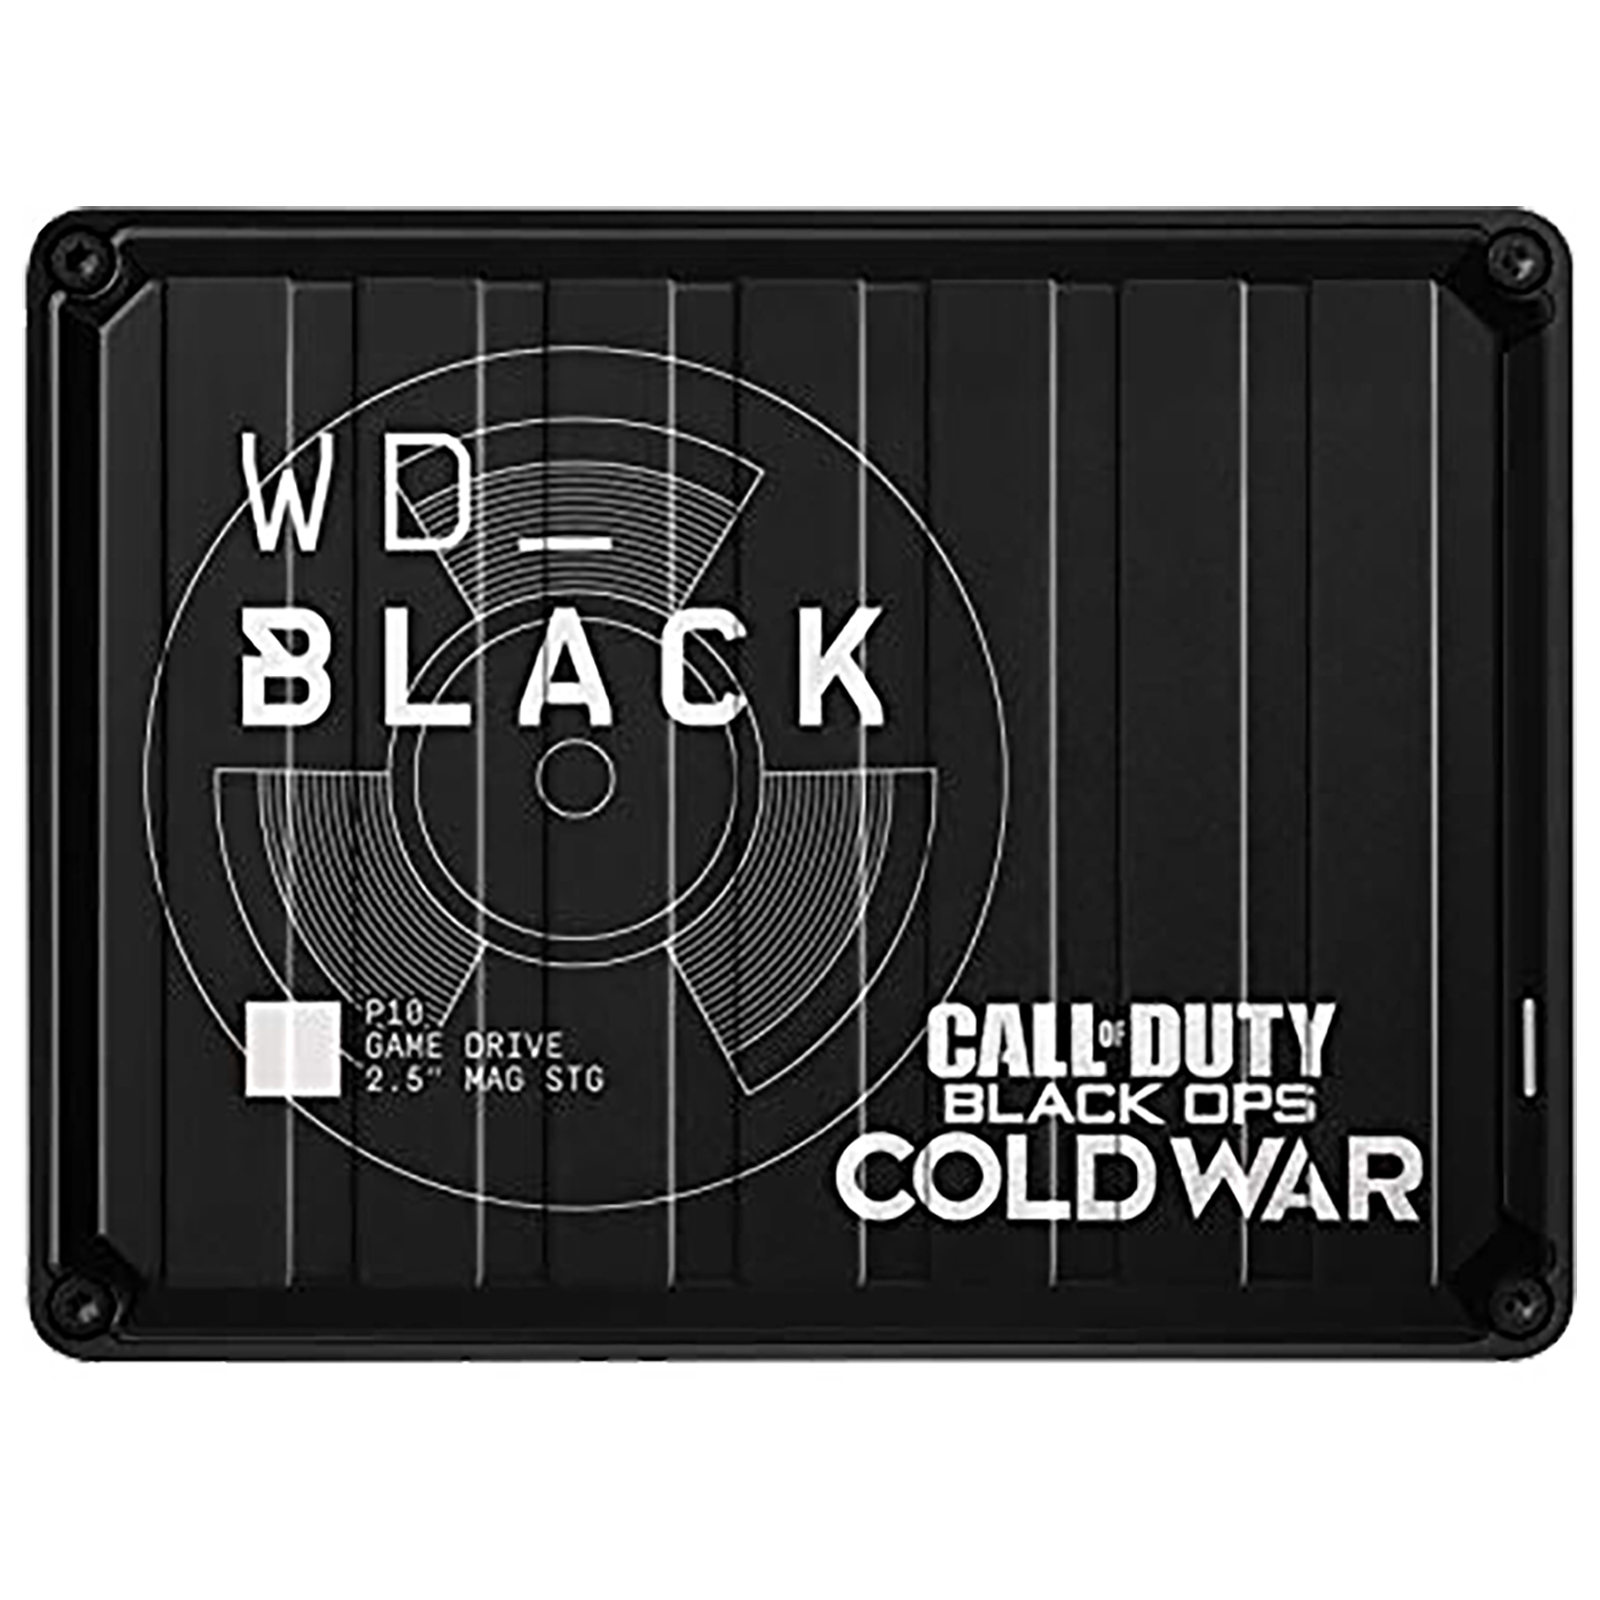 Western Digital WD_BLACK P10 2 TB USB 3.2 Game Drive (Call of Duty: Black Ops Cold War Edition, WDBAZC0020BBK-WESN, Black)_1